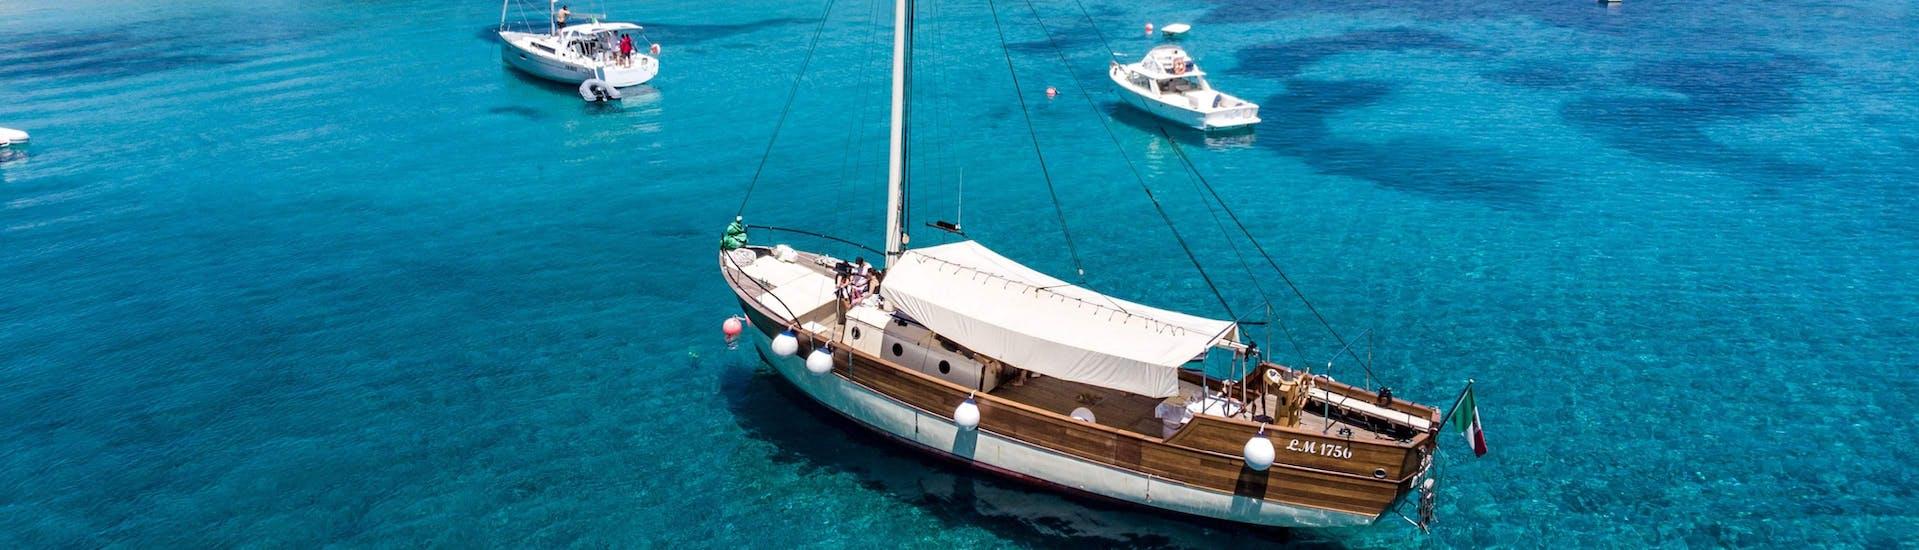 The sailing boat from Maggior Leggero Tour is anchored in the bay during the Semi-Private Sailing Boat Trip to La Maddalena Archipelago.